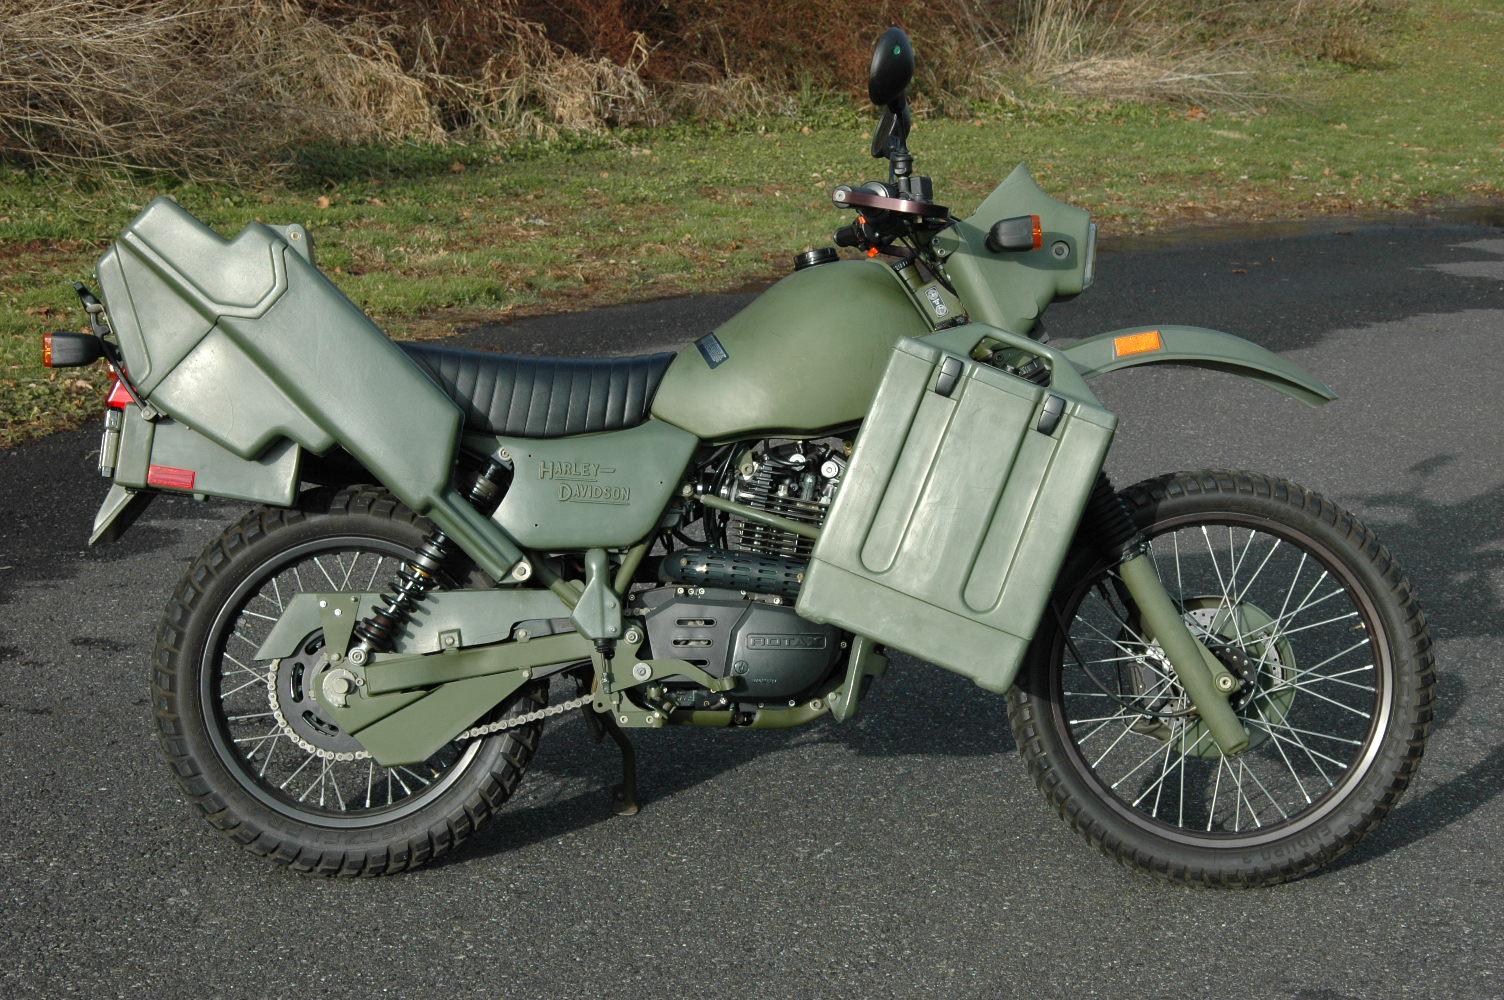 Harley Davidson Army: RARE HARLEY DAVIDSON MT-500 MT500 MILITARY MOTORCYCLE